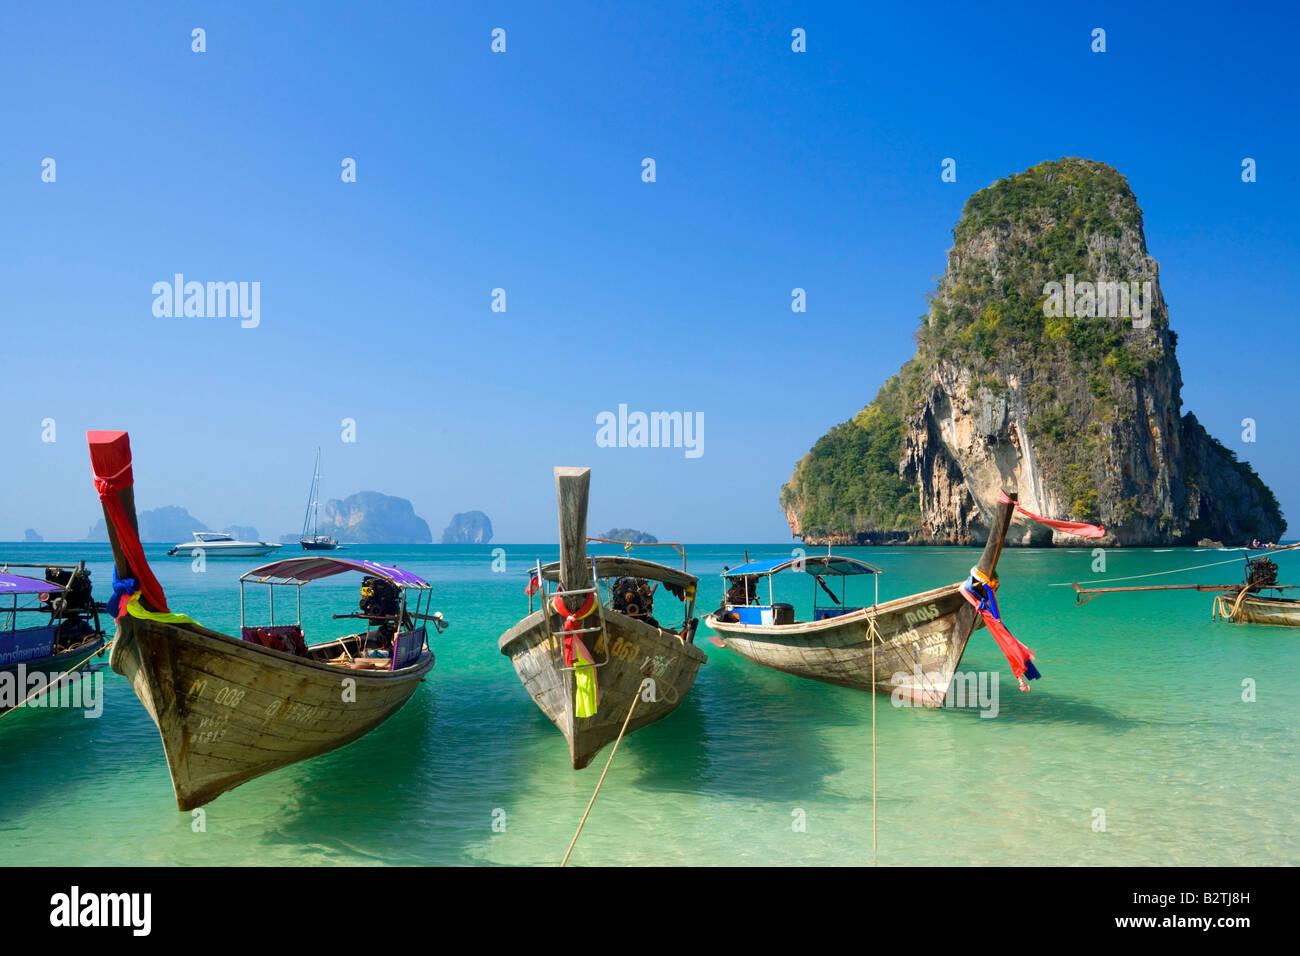 Verankerte Boote, Kreidefelsen im Hintergrund, Laem Phra Nang, Railay, Phra Nang Beach, Krabi, Thailand nach dem Stockbild